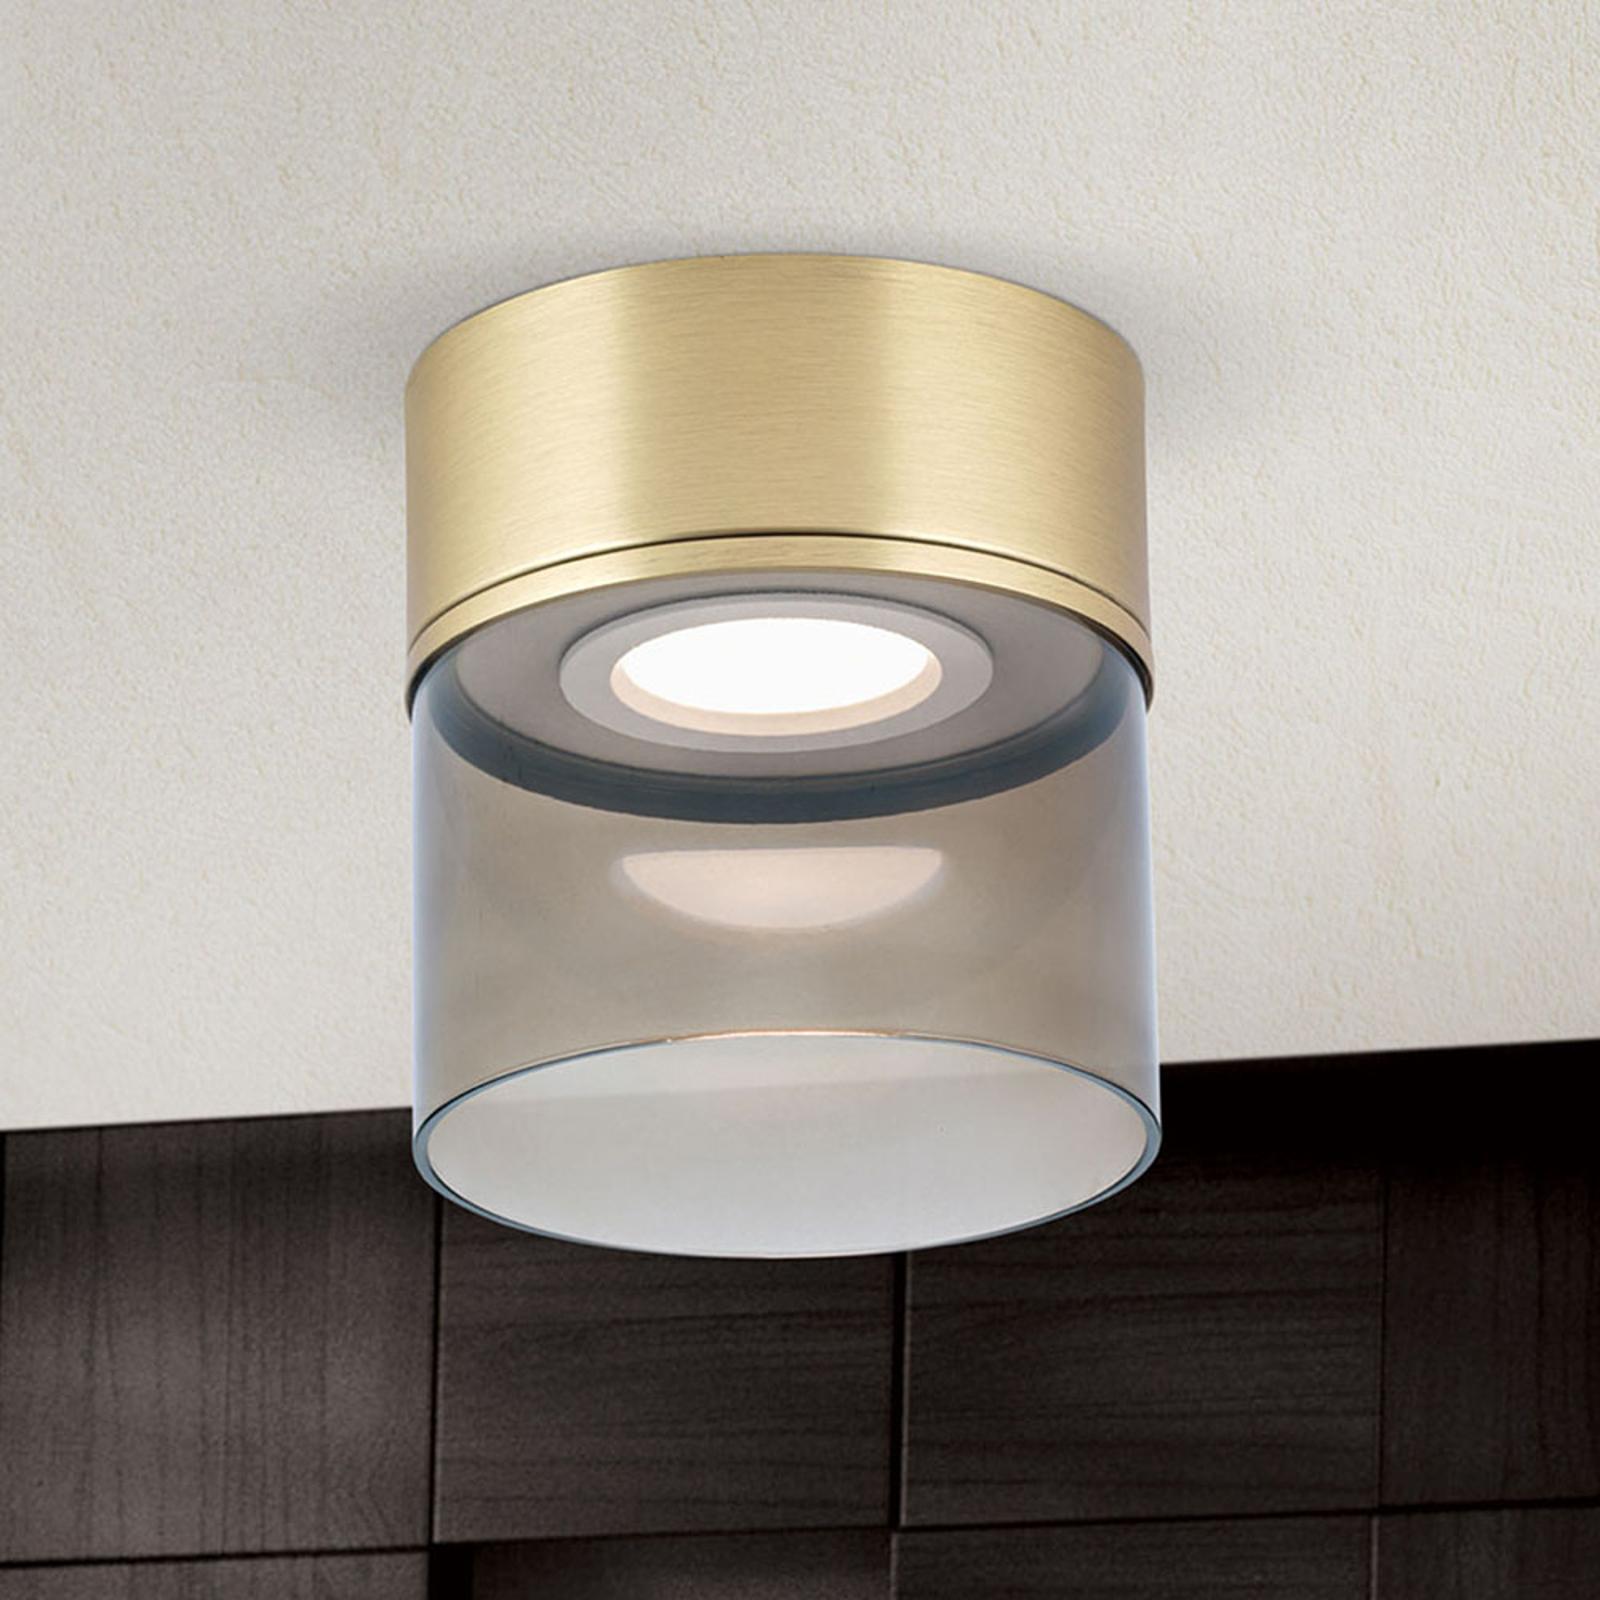 Lampa sufitowa LED Francis mosiądz matowy Ø 15 cm